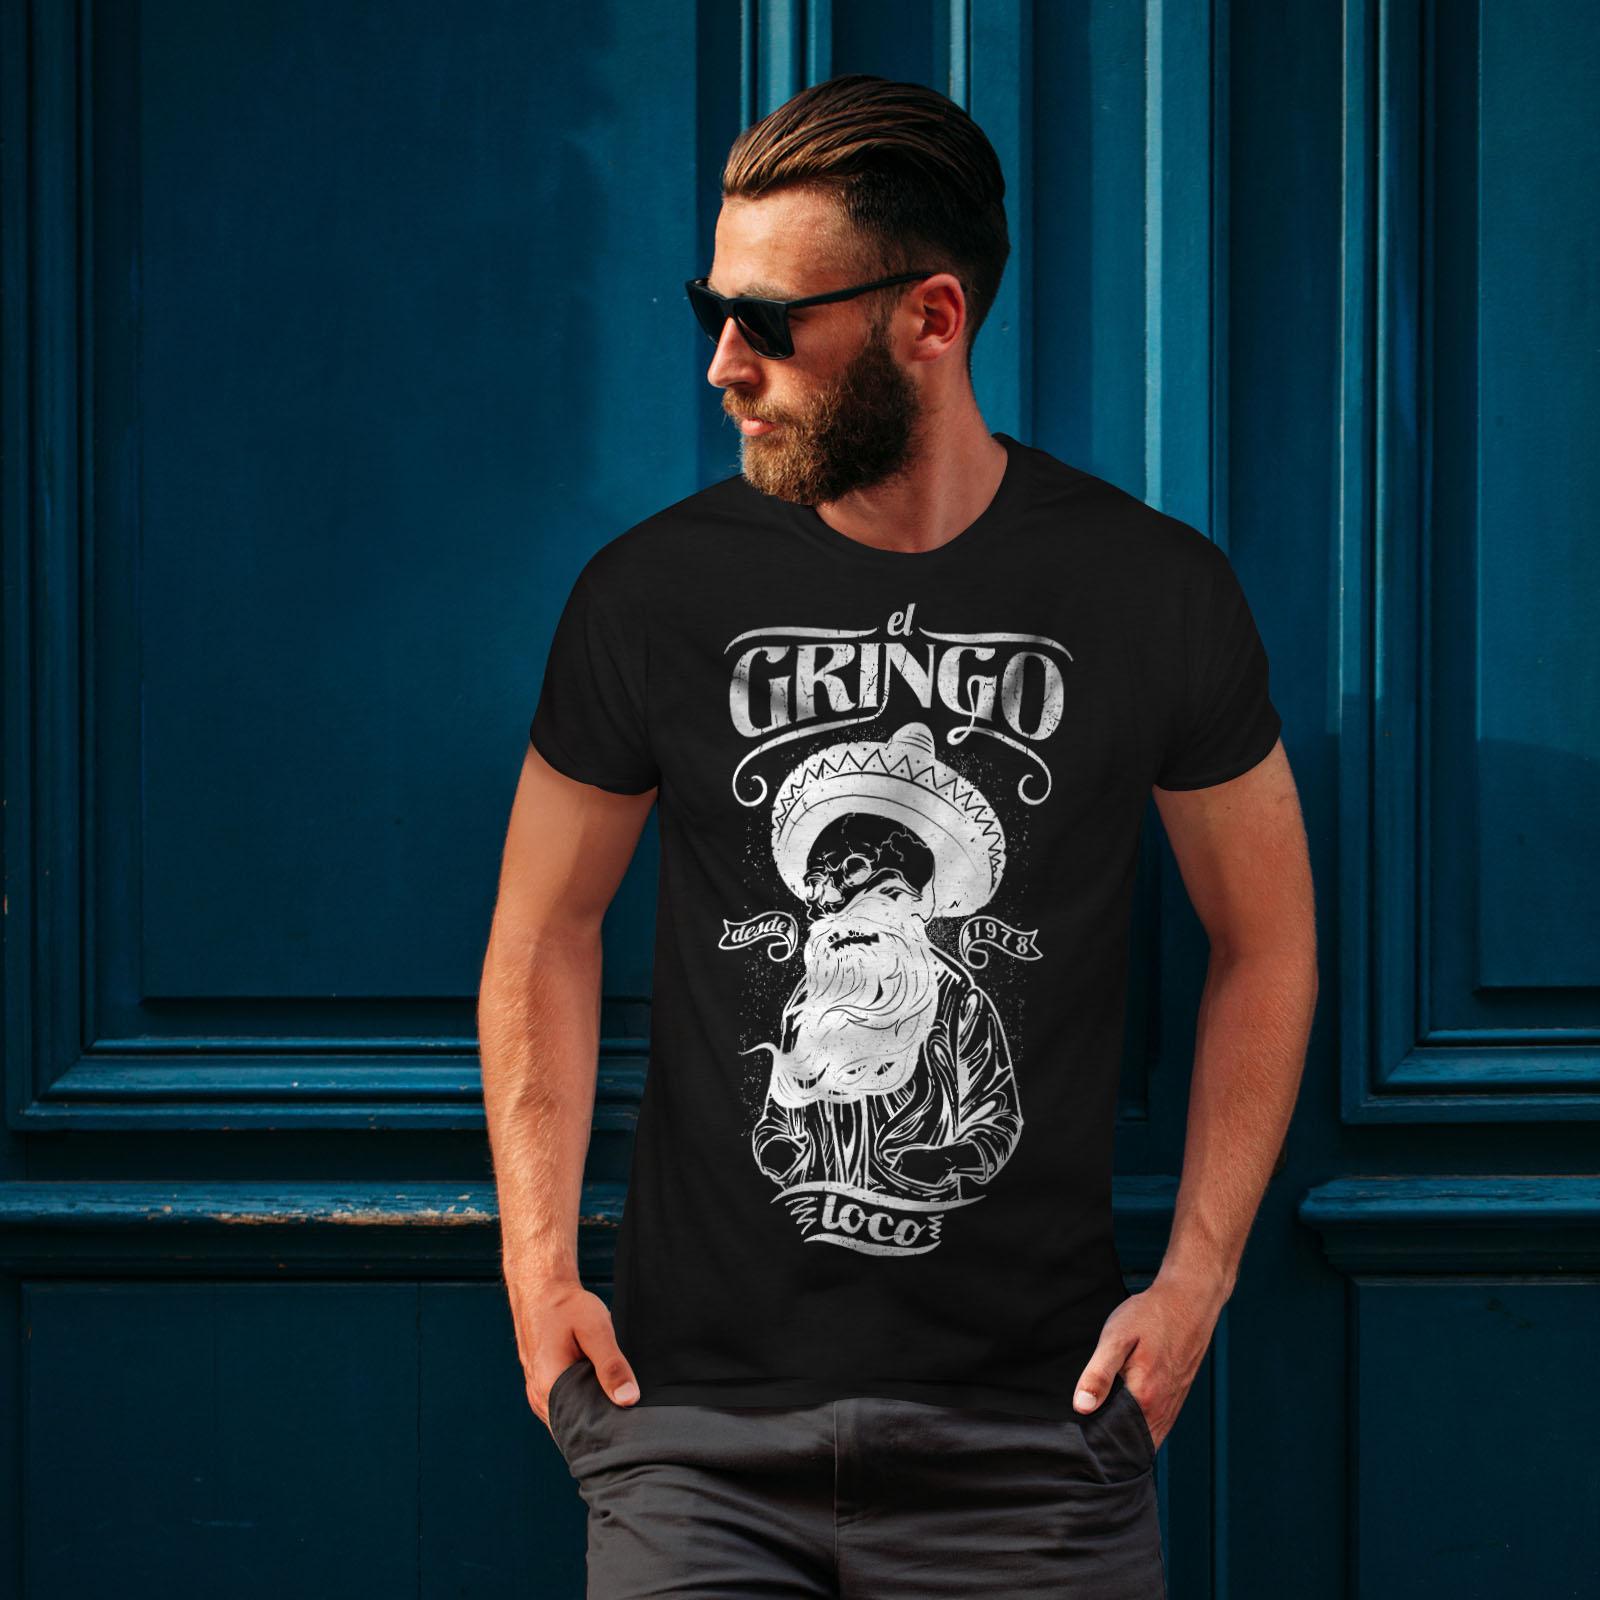 Wellcoda-Gringo-Beard-Skull-Mens-T-shirt-Mexico-Graphic-Design-Printed-Tee thumbnail 4